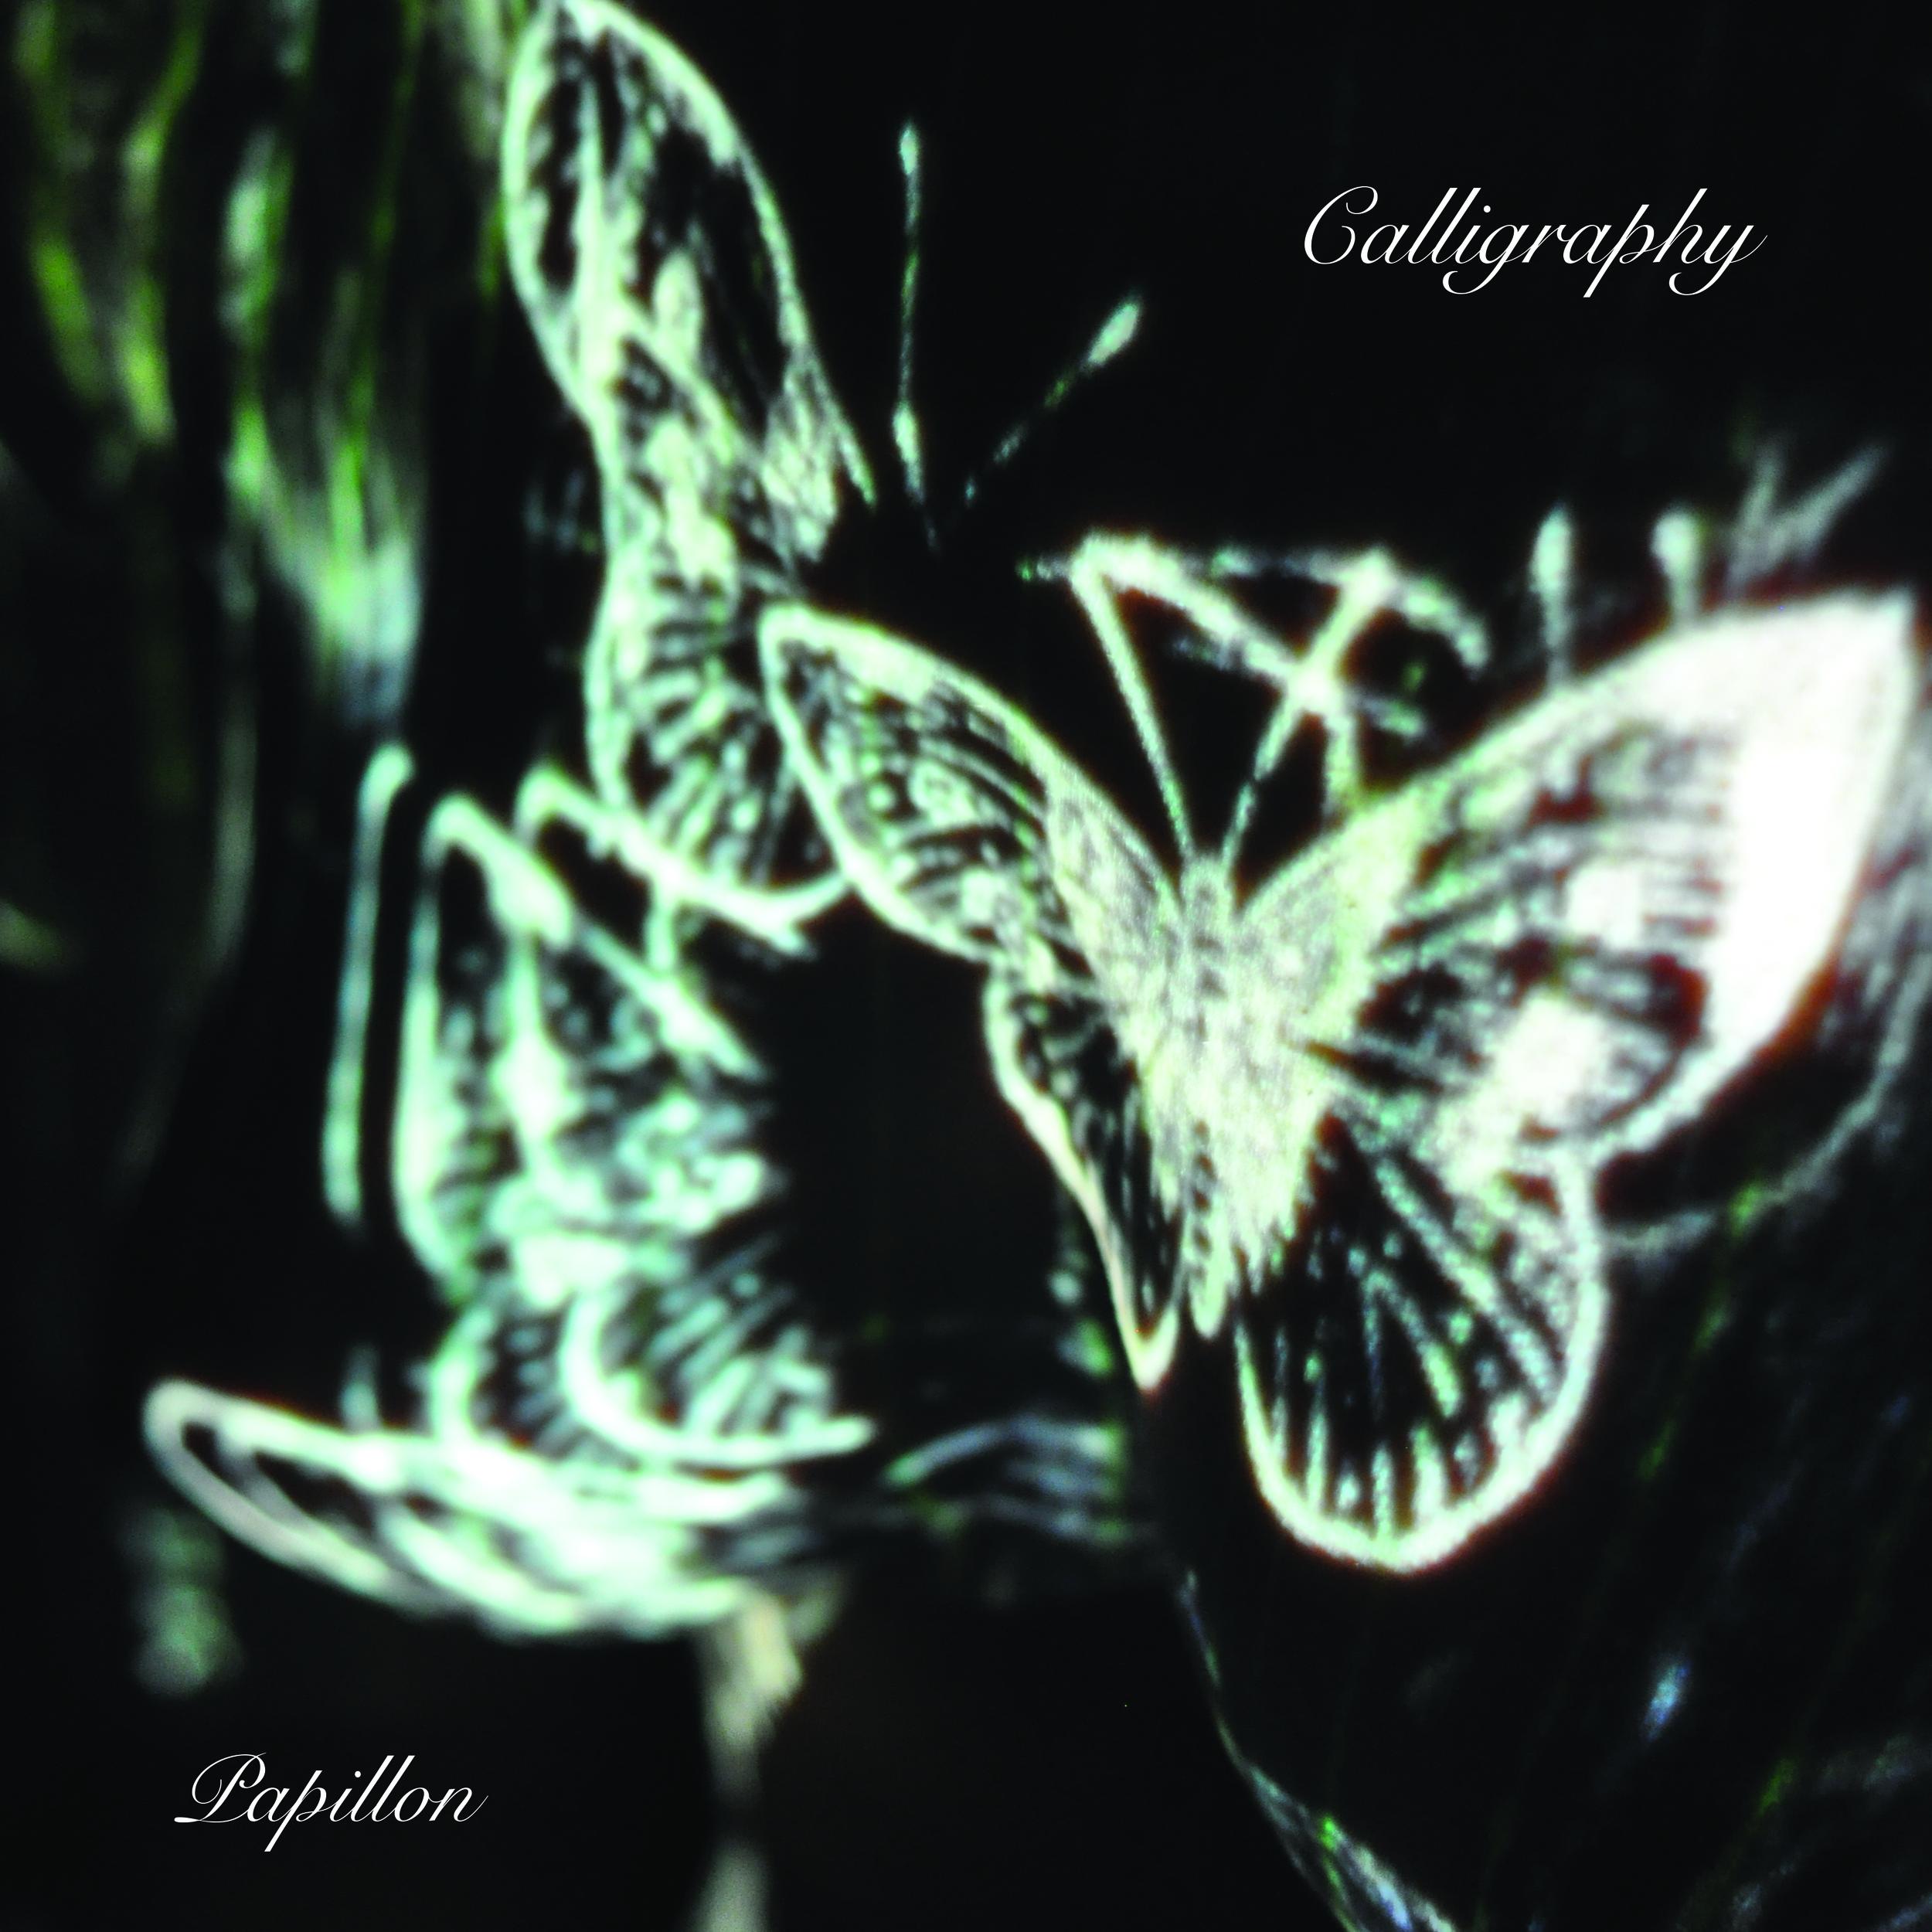 """Calligraphy"" Papillon - Double vinyl - BSURE 2014"